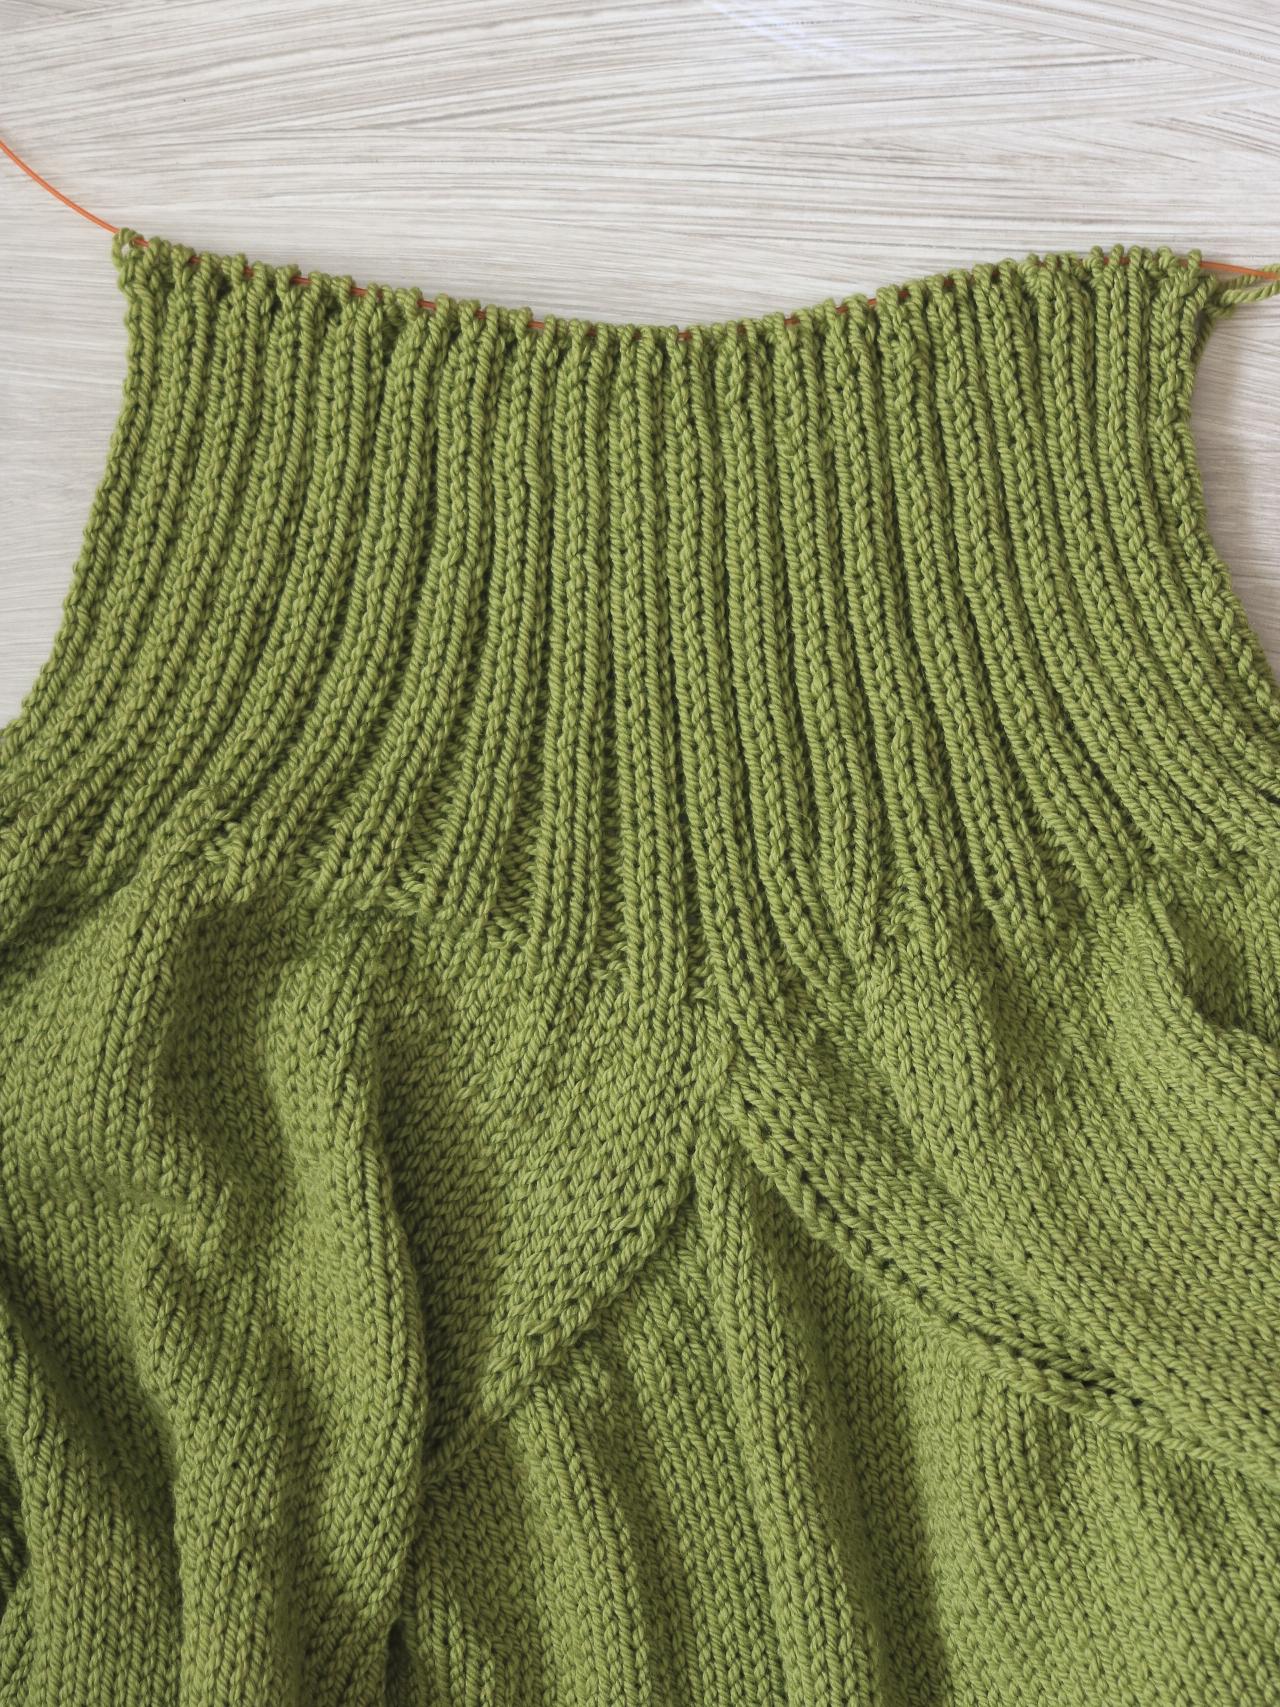 Neck rib on the Carbeth Cardigan using Baa Baa Bulky yarn from Ewe Ewe.